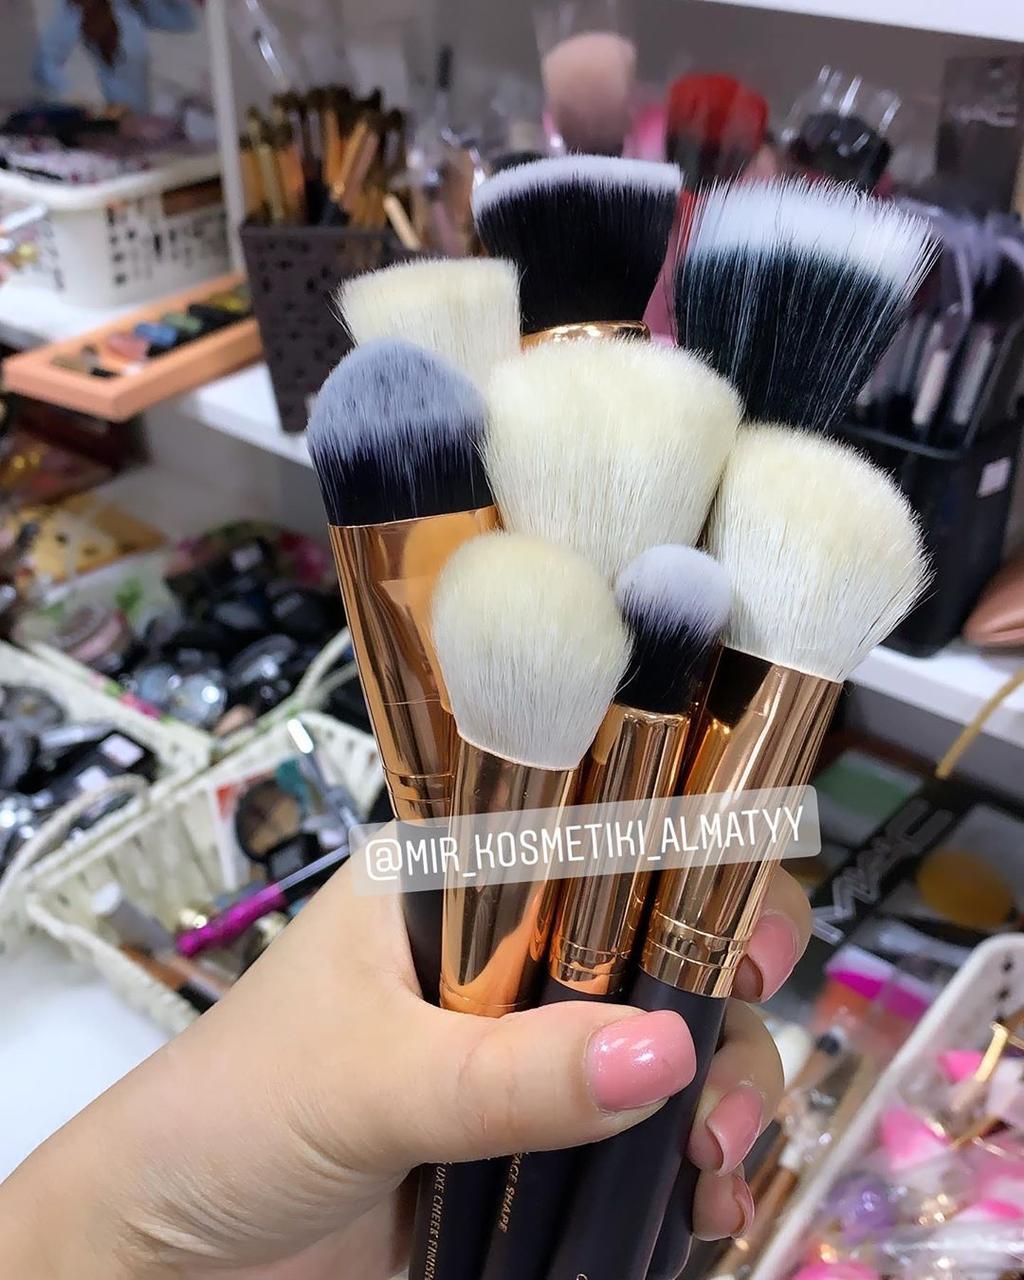 Кисти для макияжа от Zoeva